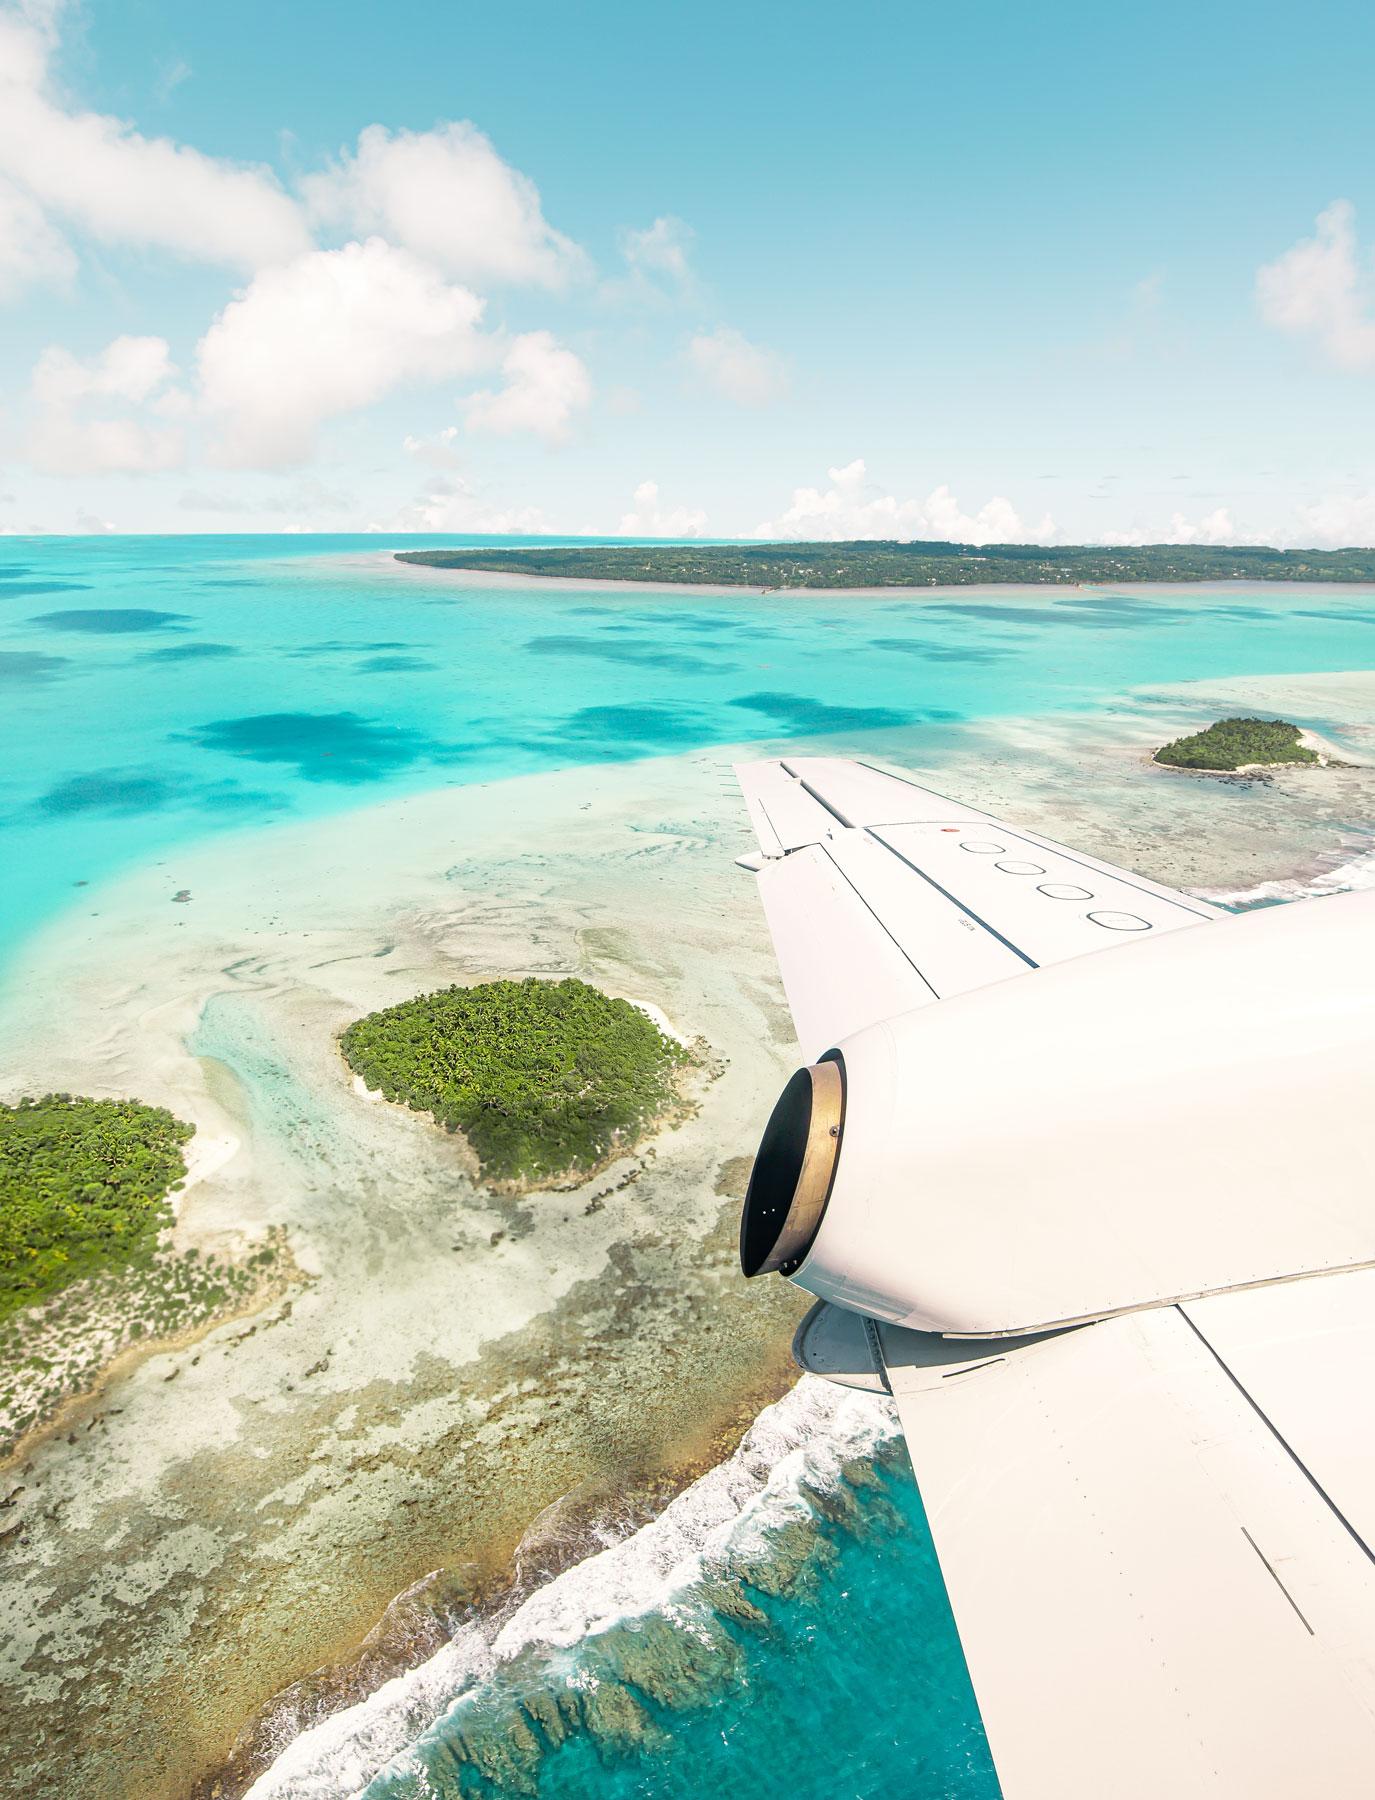 Cook Islands Travel Guide – Rarotonga – Aitutaki – Kelsey Heinrichs - @kelseyinlondon